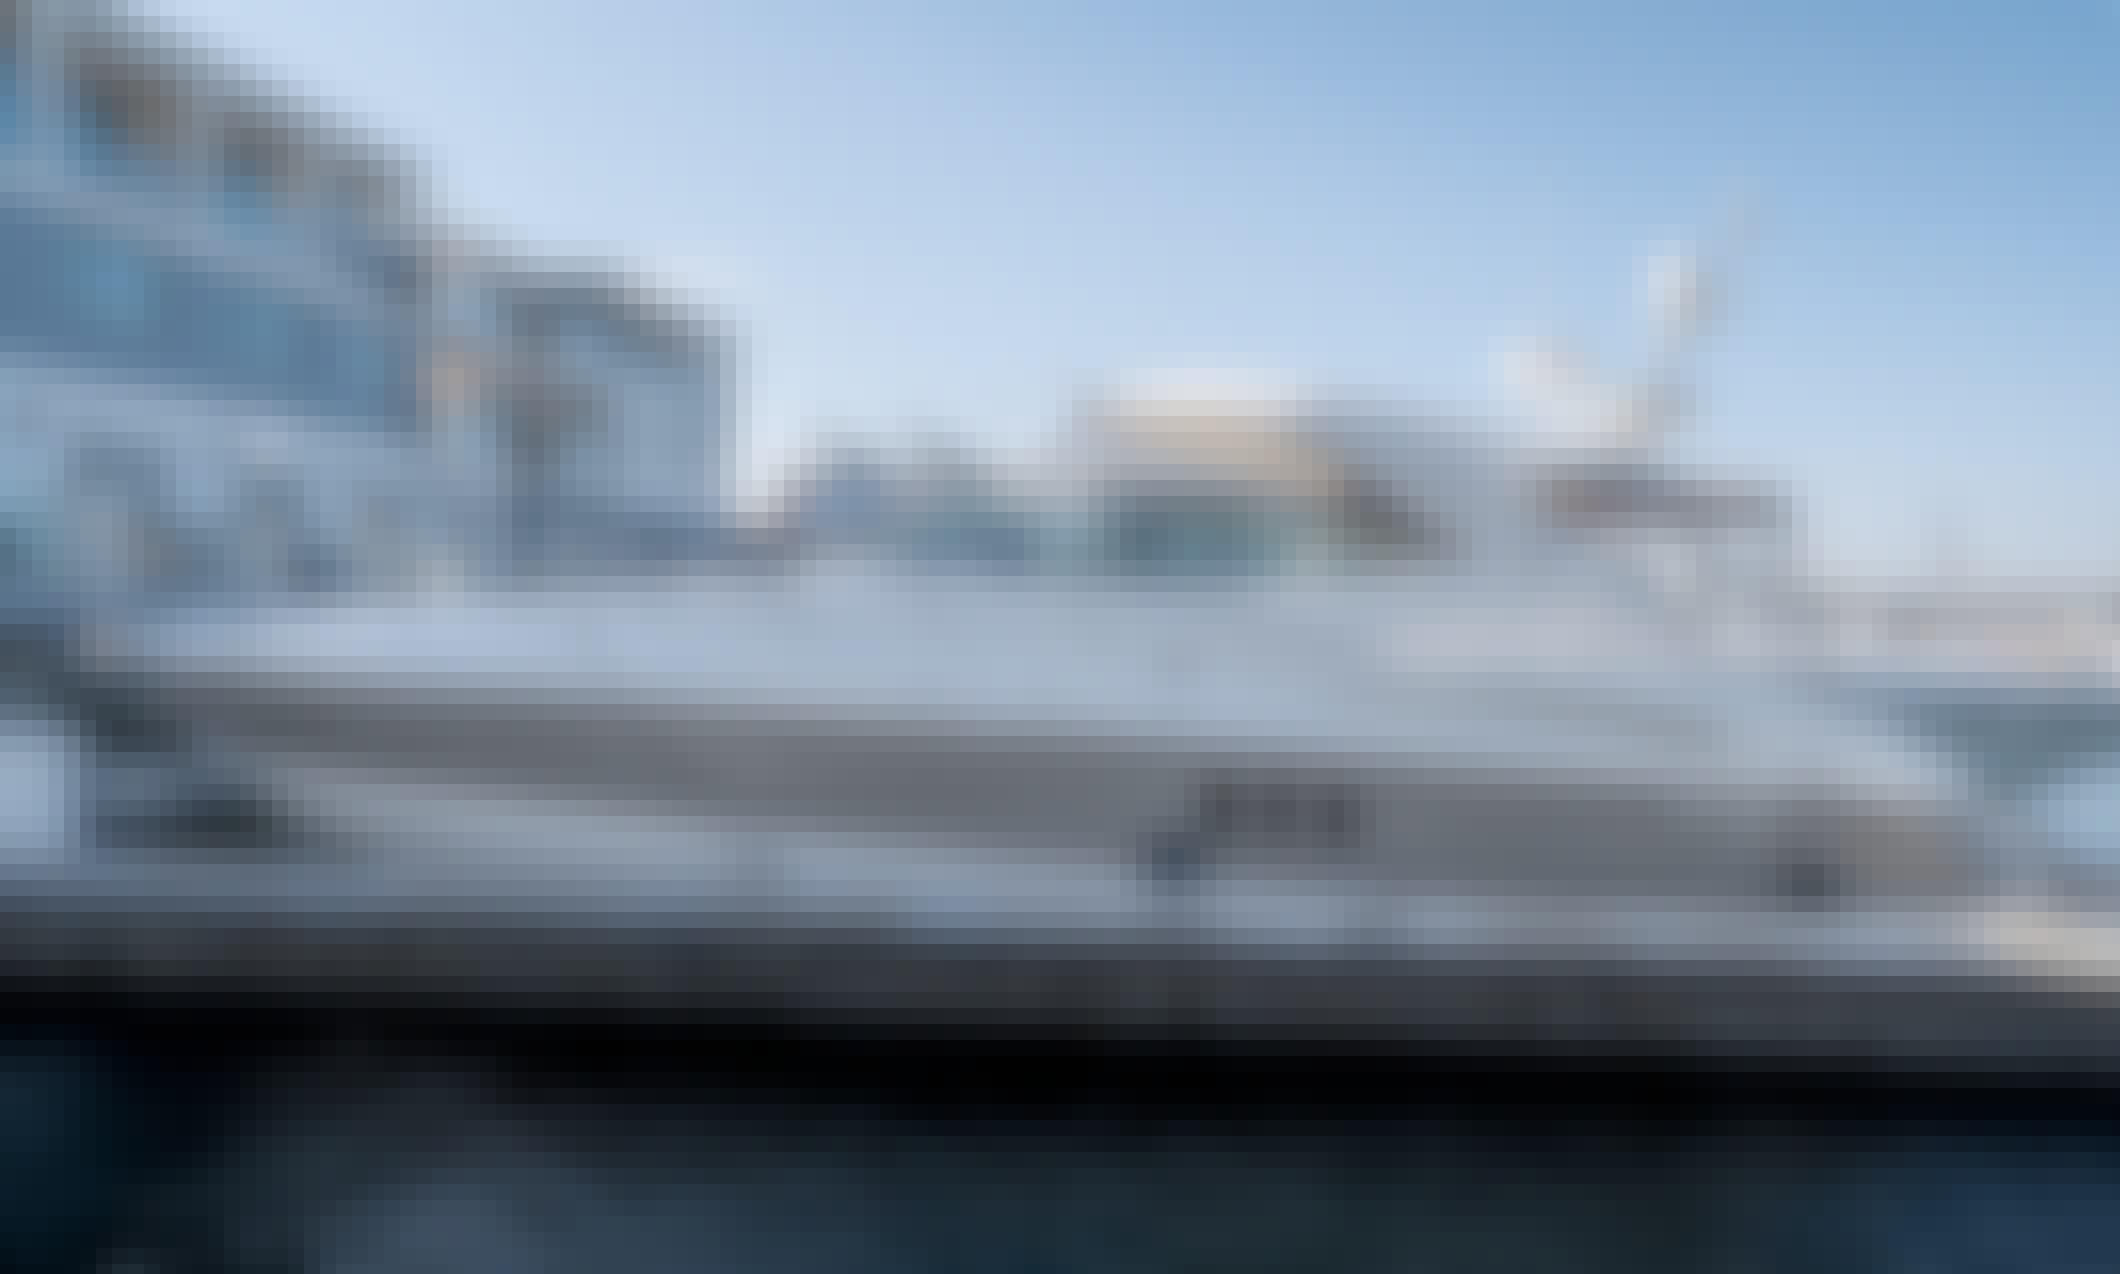 Yacht rental for 12 people in Newport Beach, CA